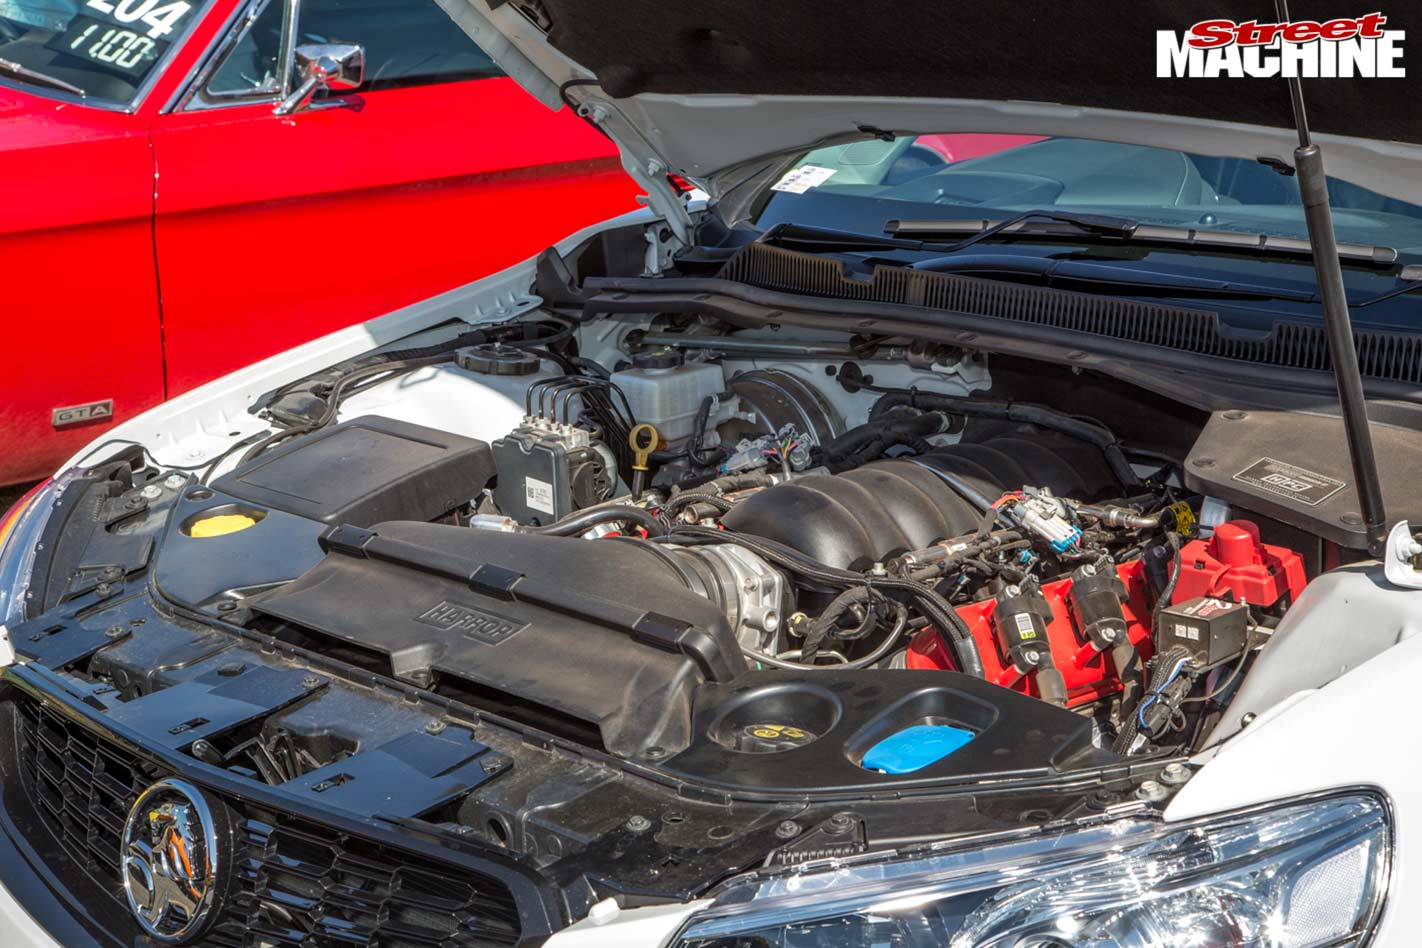 Holden VF sportwagon engine bay